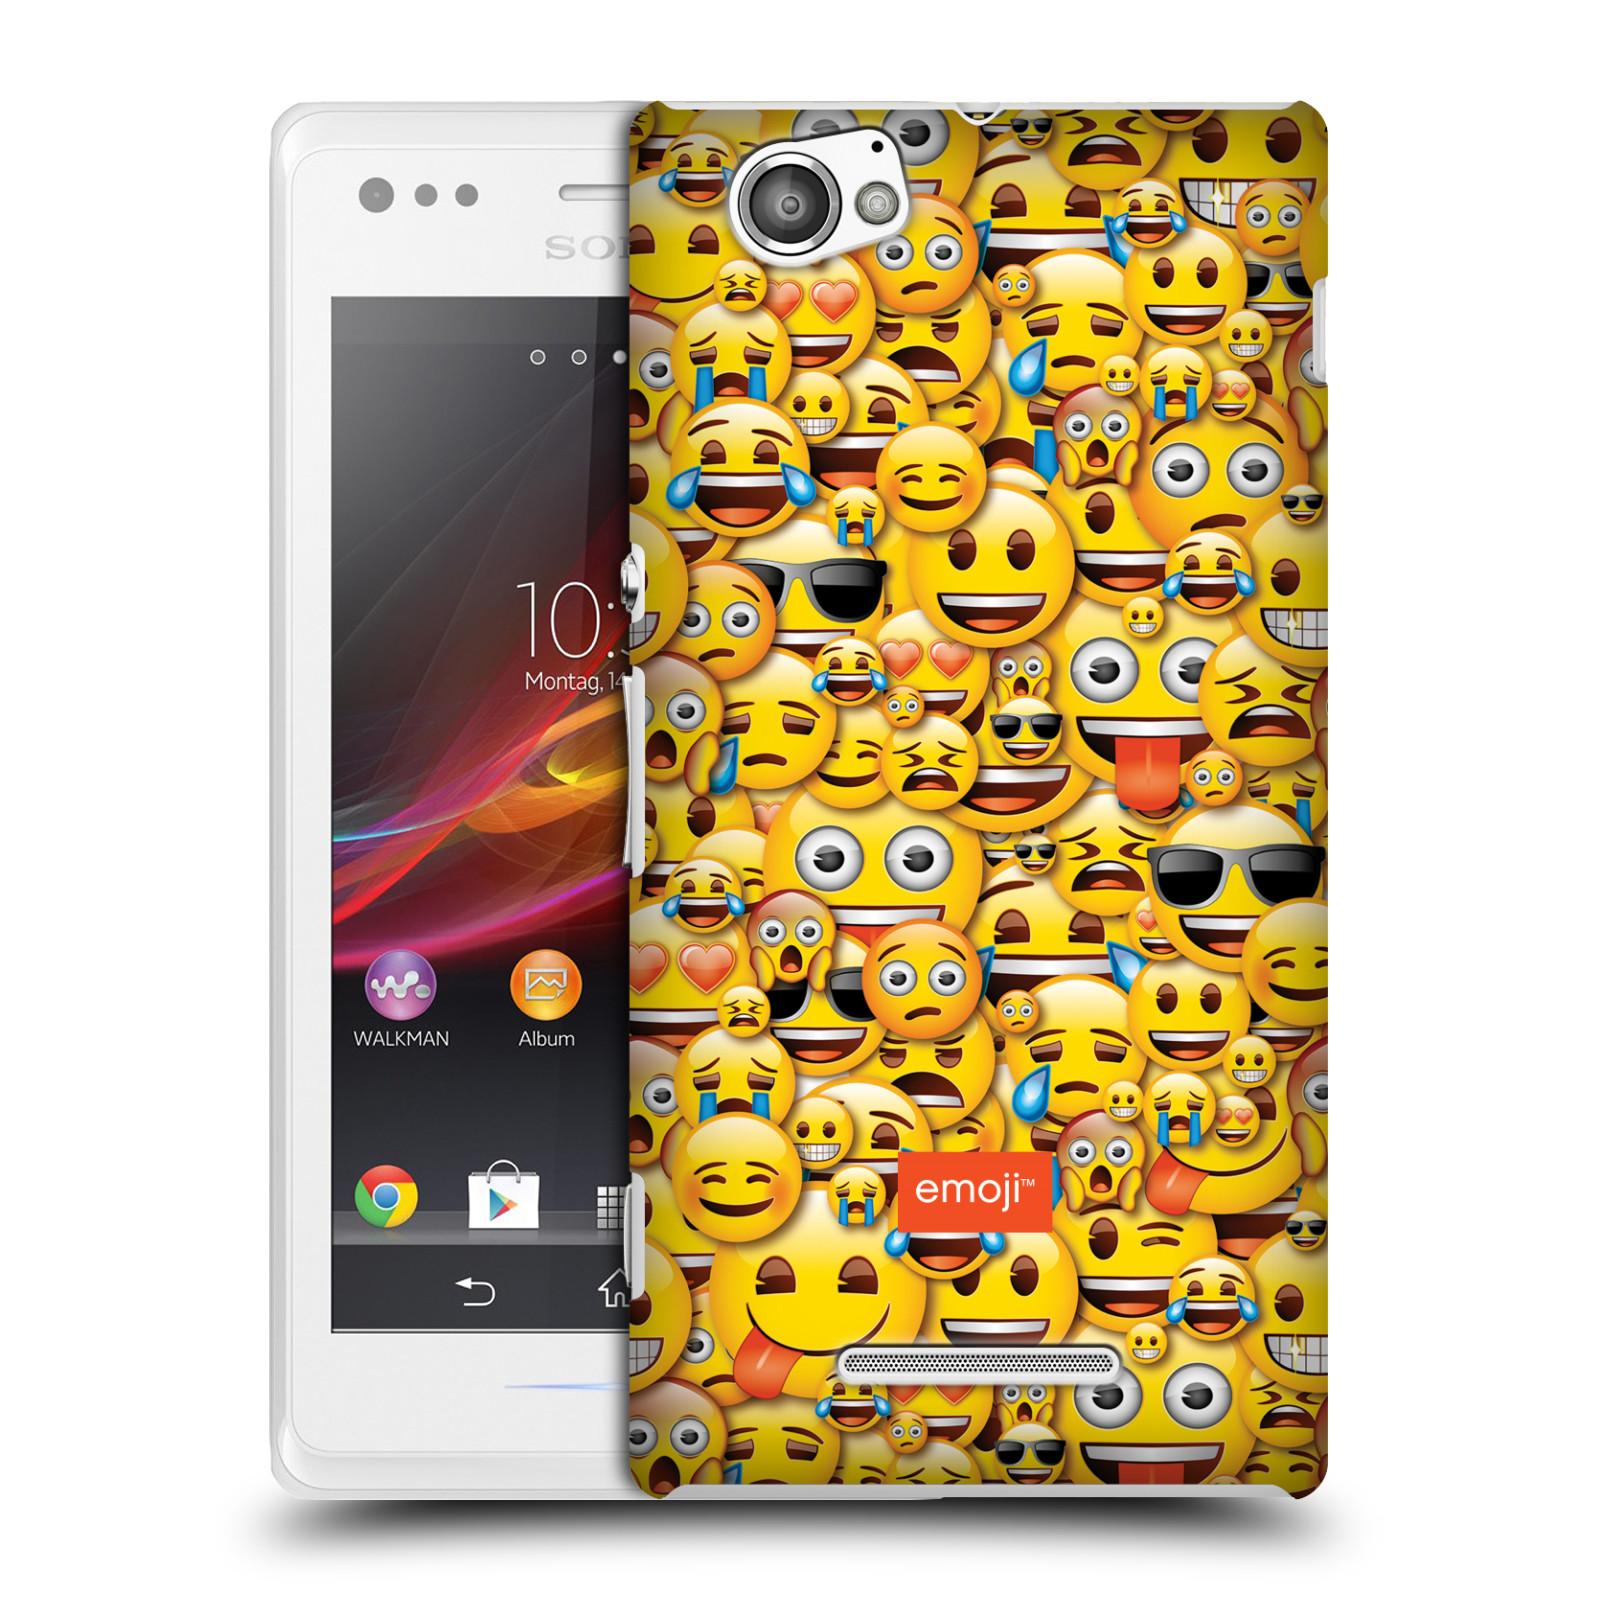 Plastové pouzdro na mobil Sony Xperia M C1905 HEAD CASE EMOJI - Mnoho malých smajlíků (Kryt či obal s oficiálním motivem EMOJI na mobilní telefon Sony Xperia M )